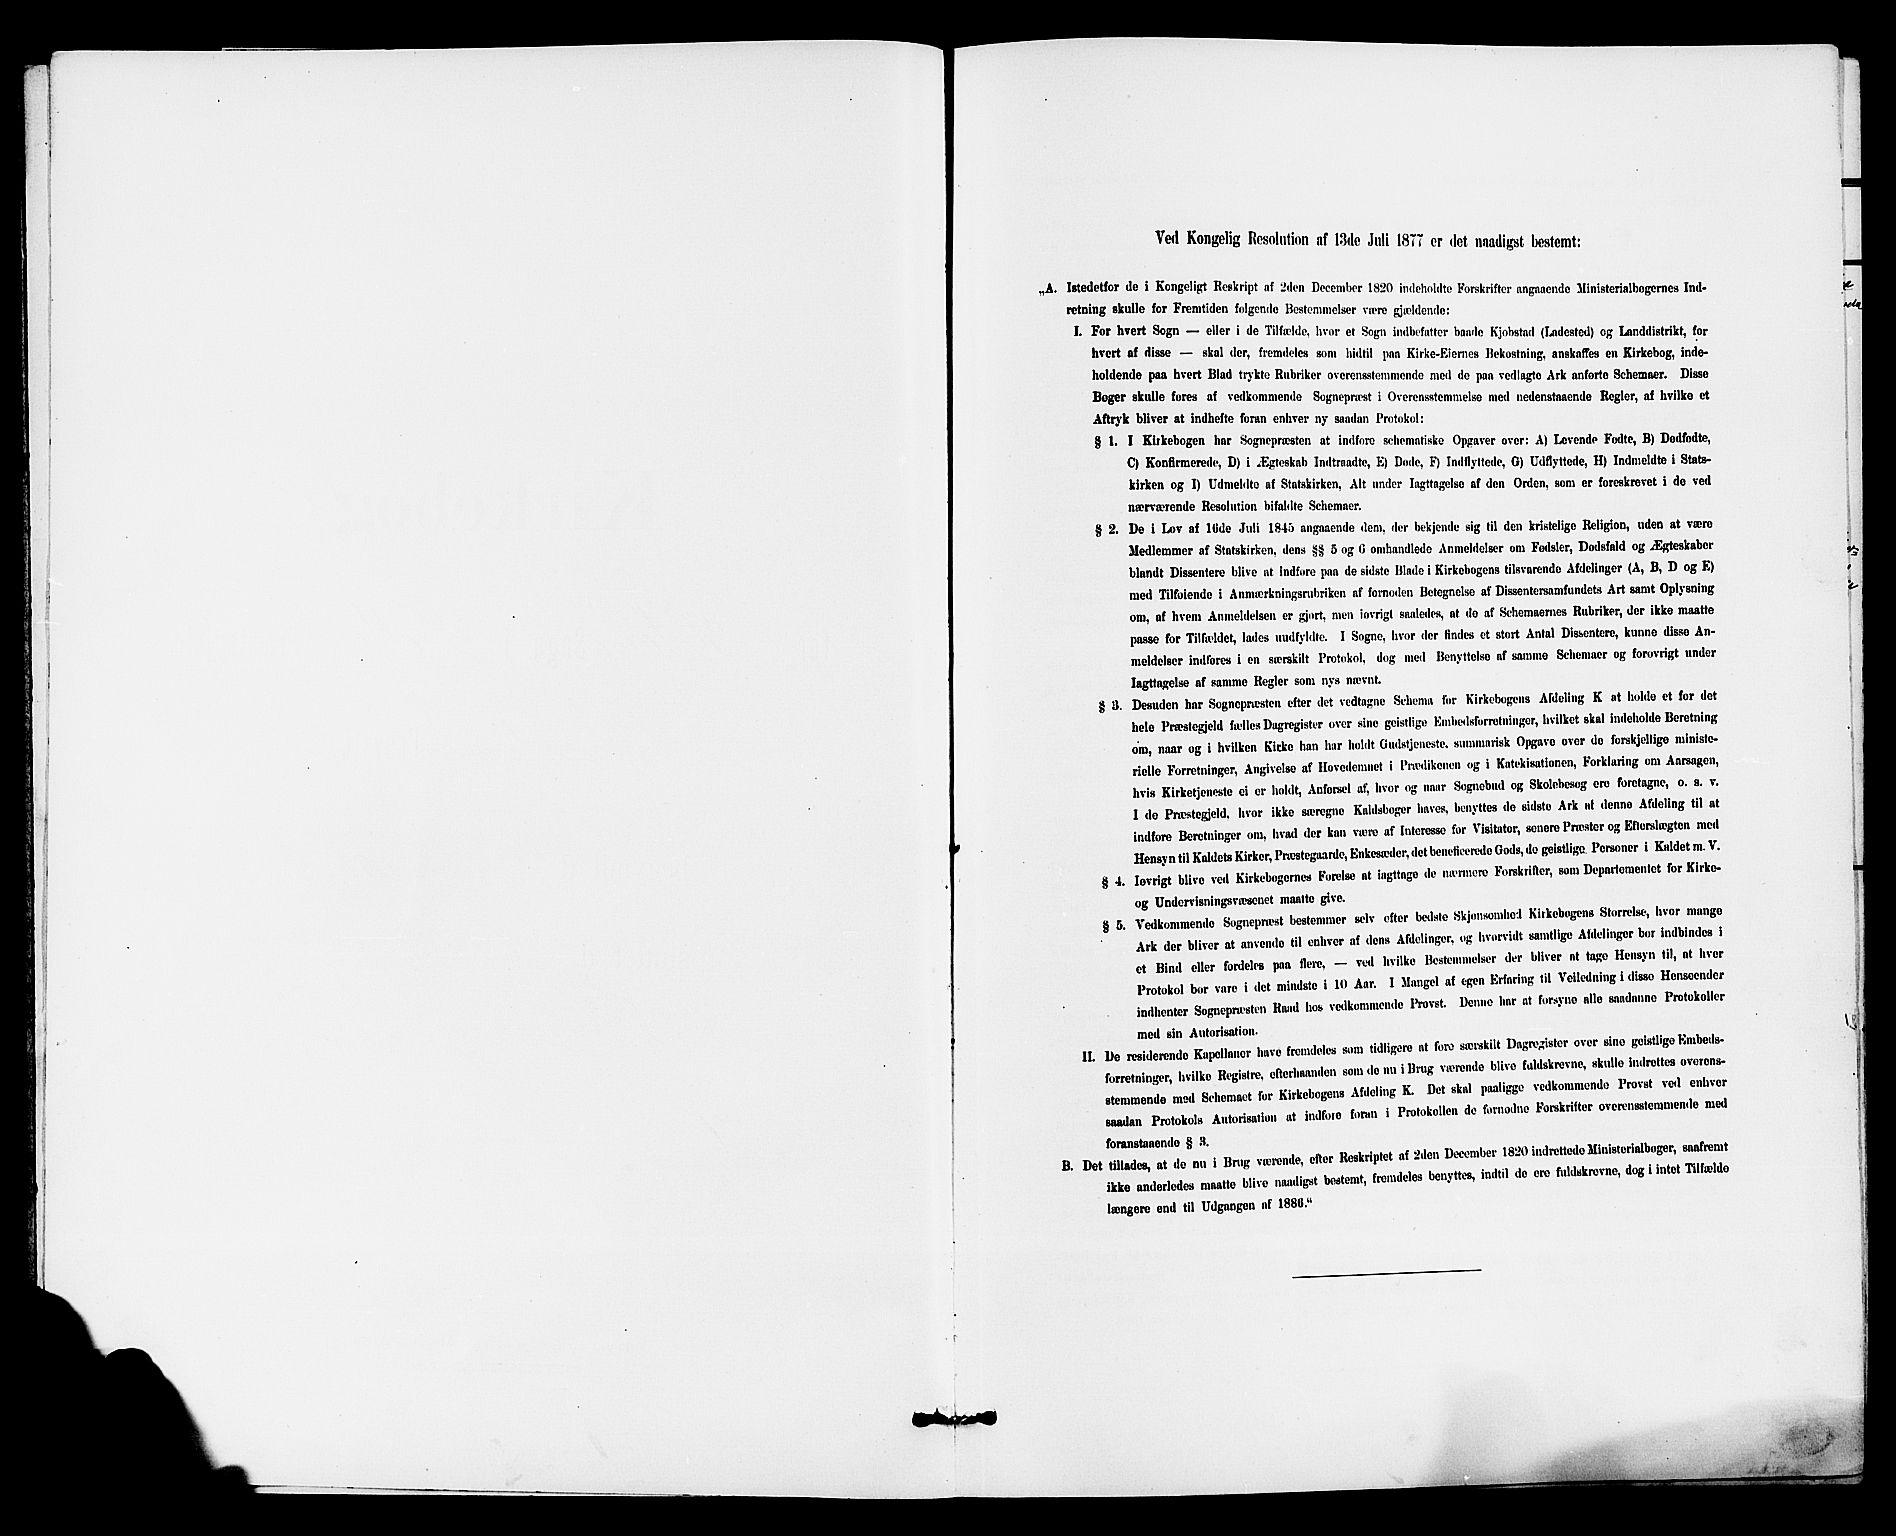 SAKO, Holla kirkebøker, G/Gb/L0002: Klokkerbok nr. II 2, 1897-1913